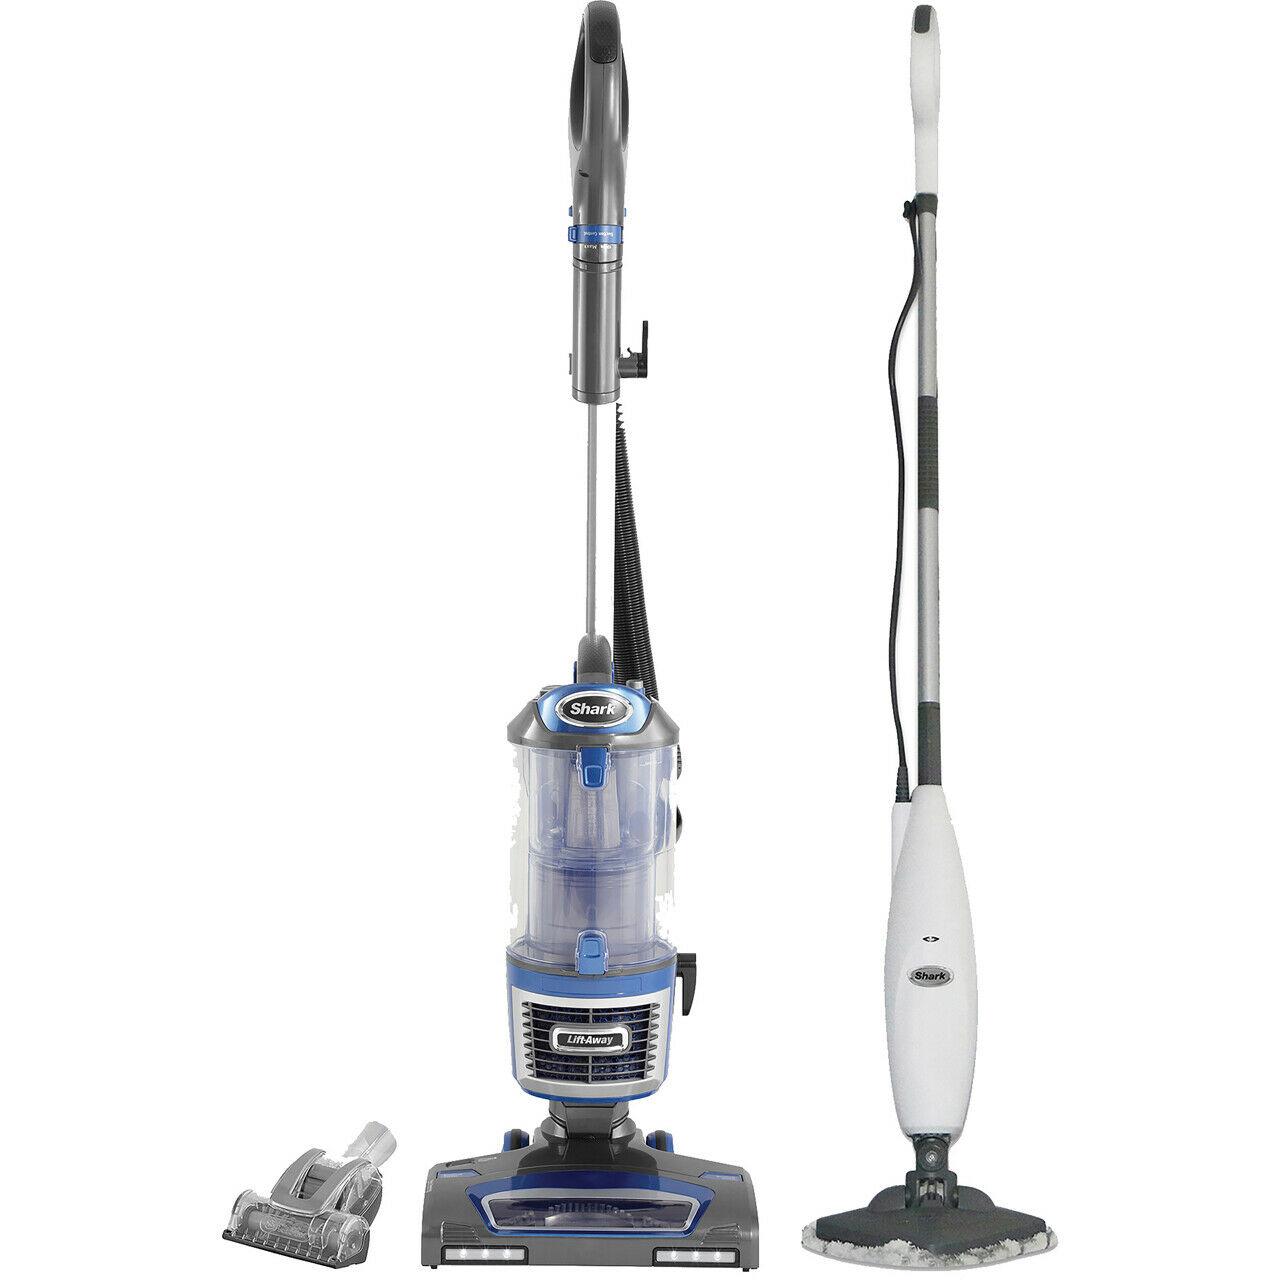 Shark NV601S3255UK Upright Vacuum Cleaner Bundle Hepa Filter Bagless 5 Year £199 AO on eBay